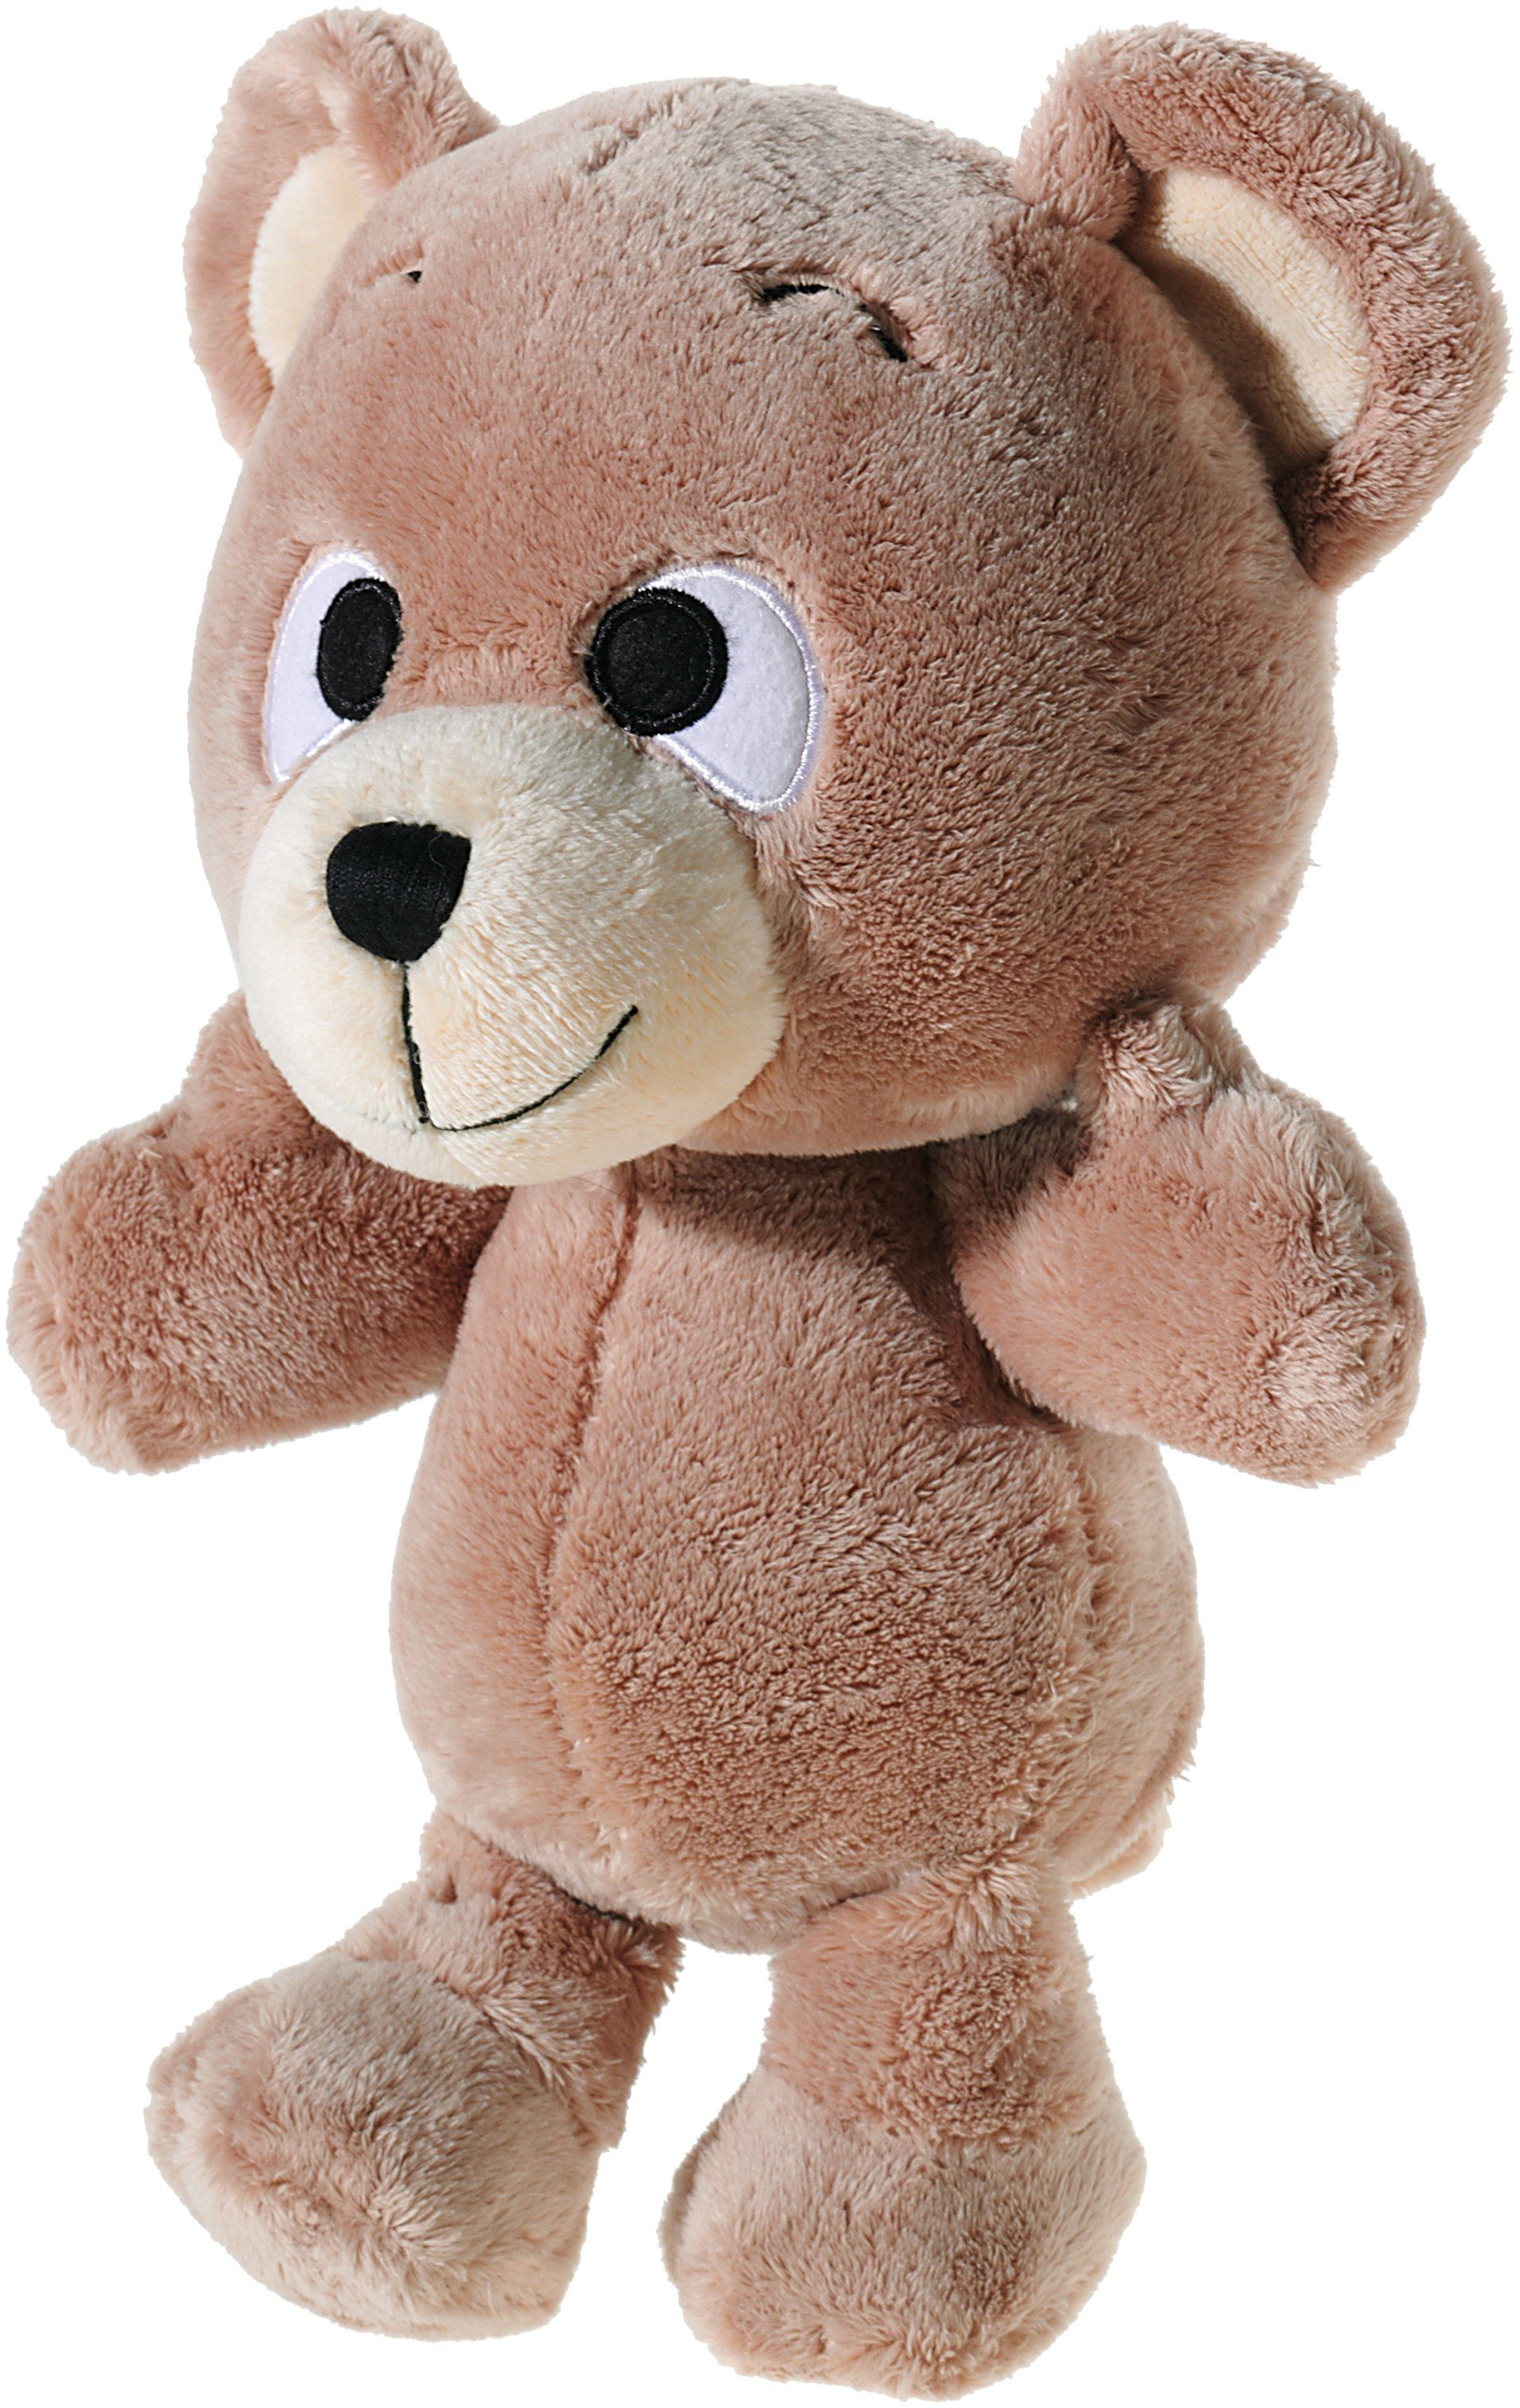 Heunec Teddybär, »Friendsheep Friendship Gang Teddy 28 cm«